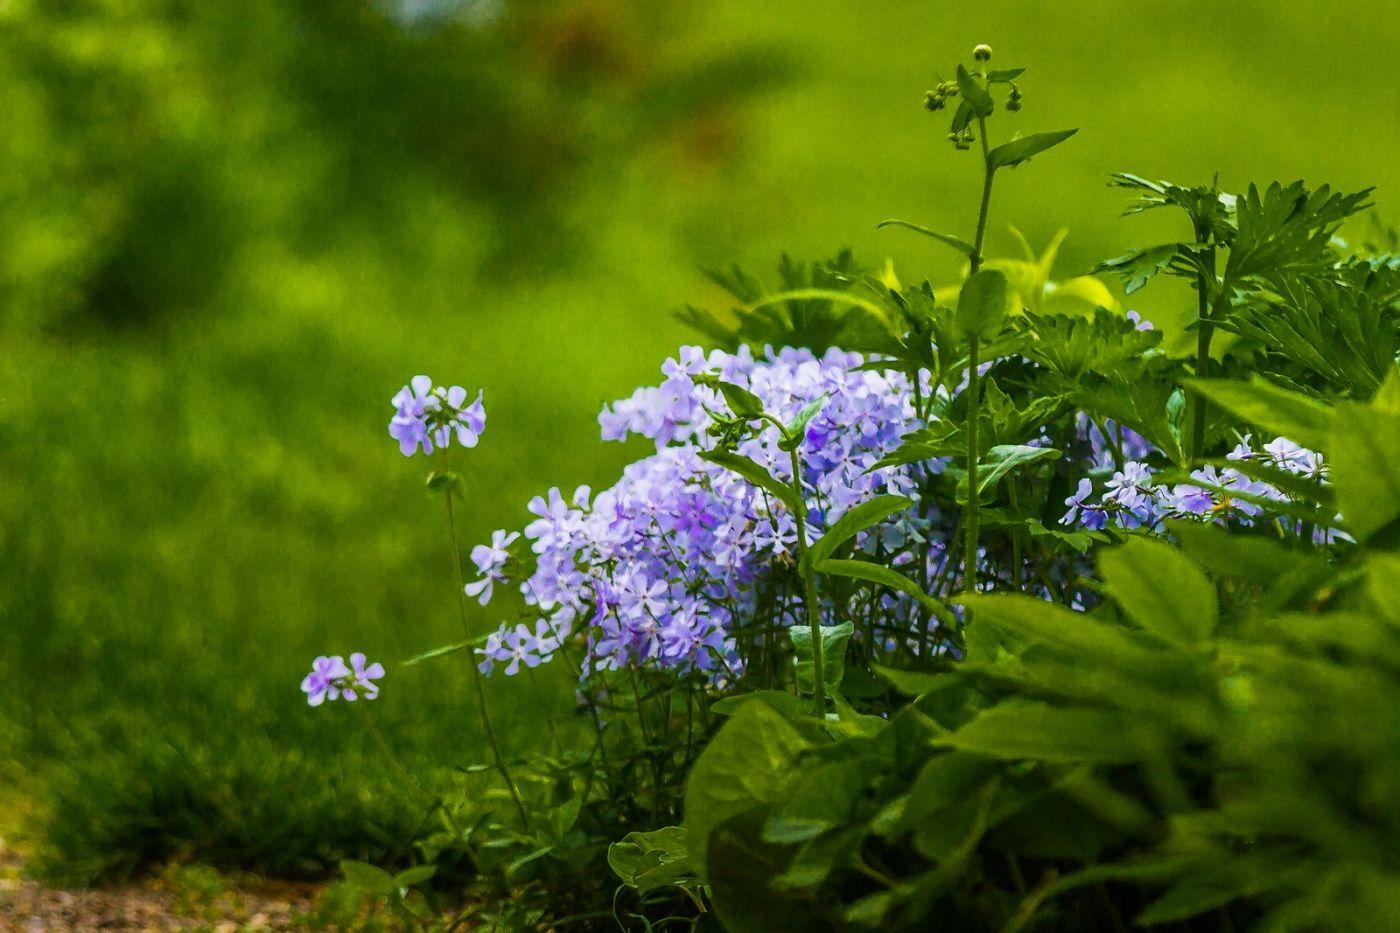 Chanticleer花园,有梦想的季节_图1-30